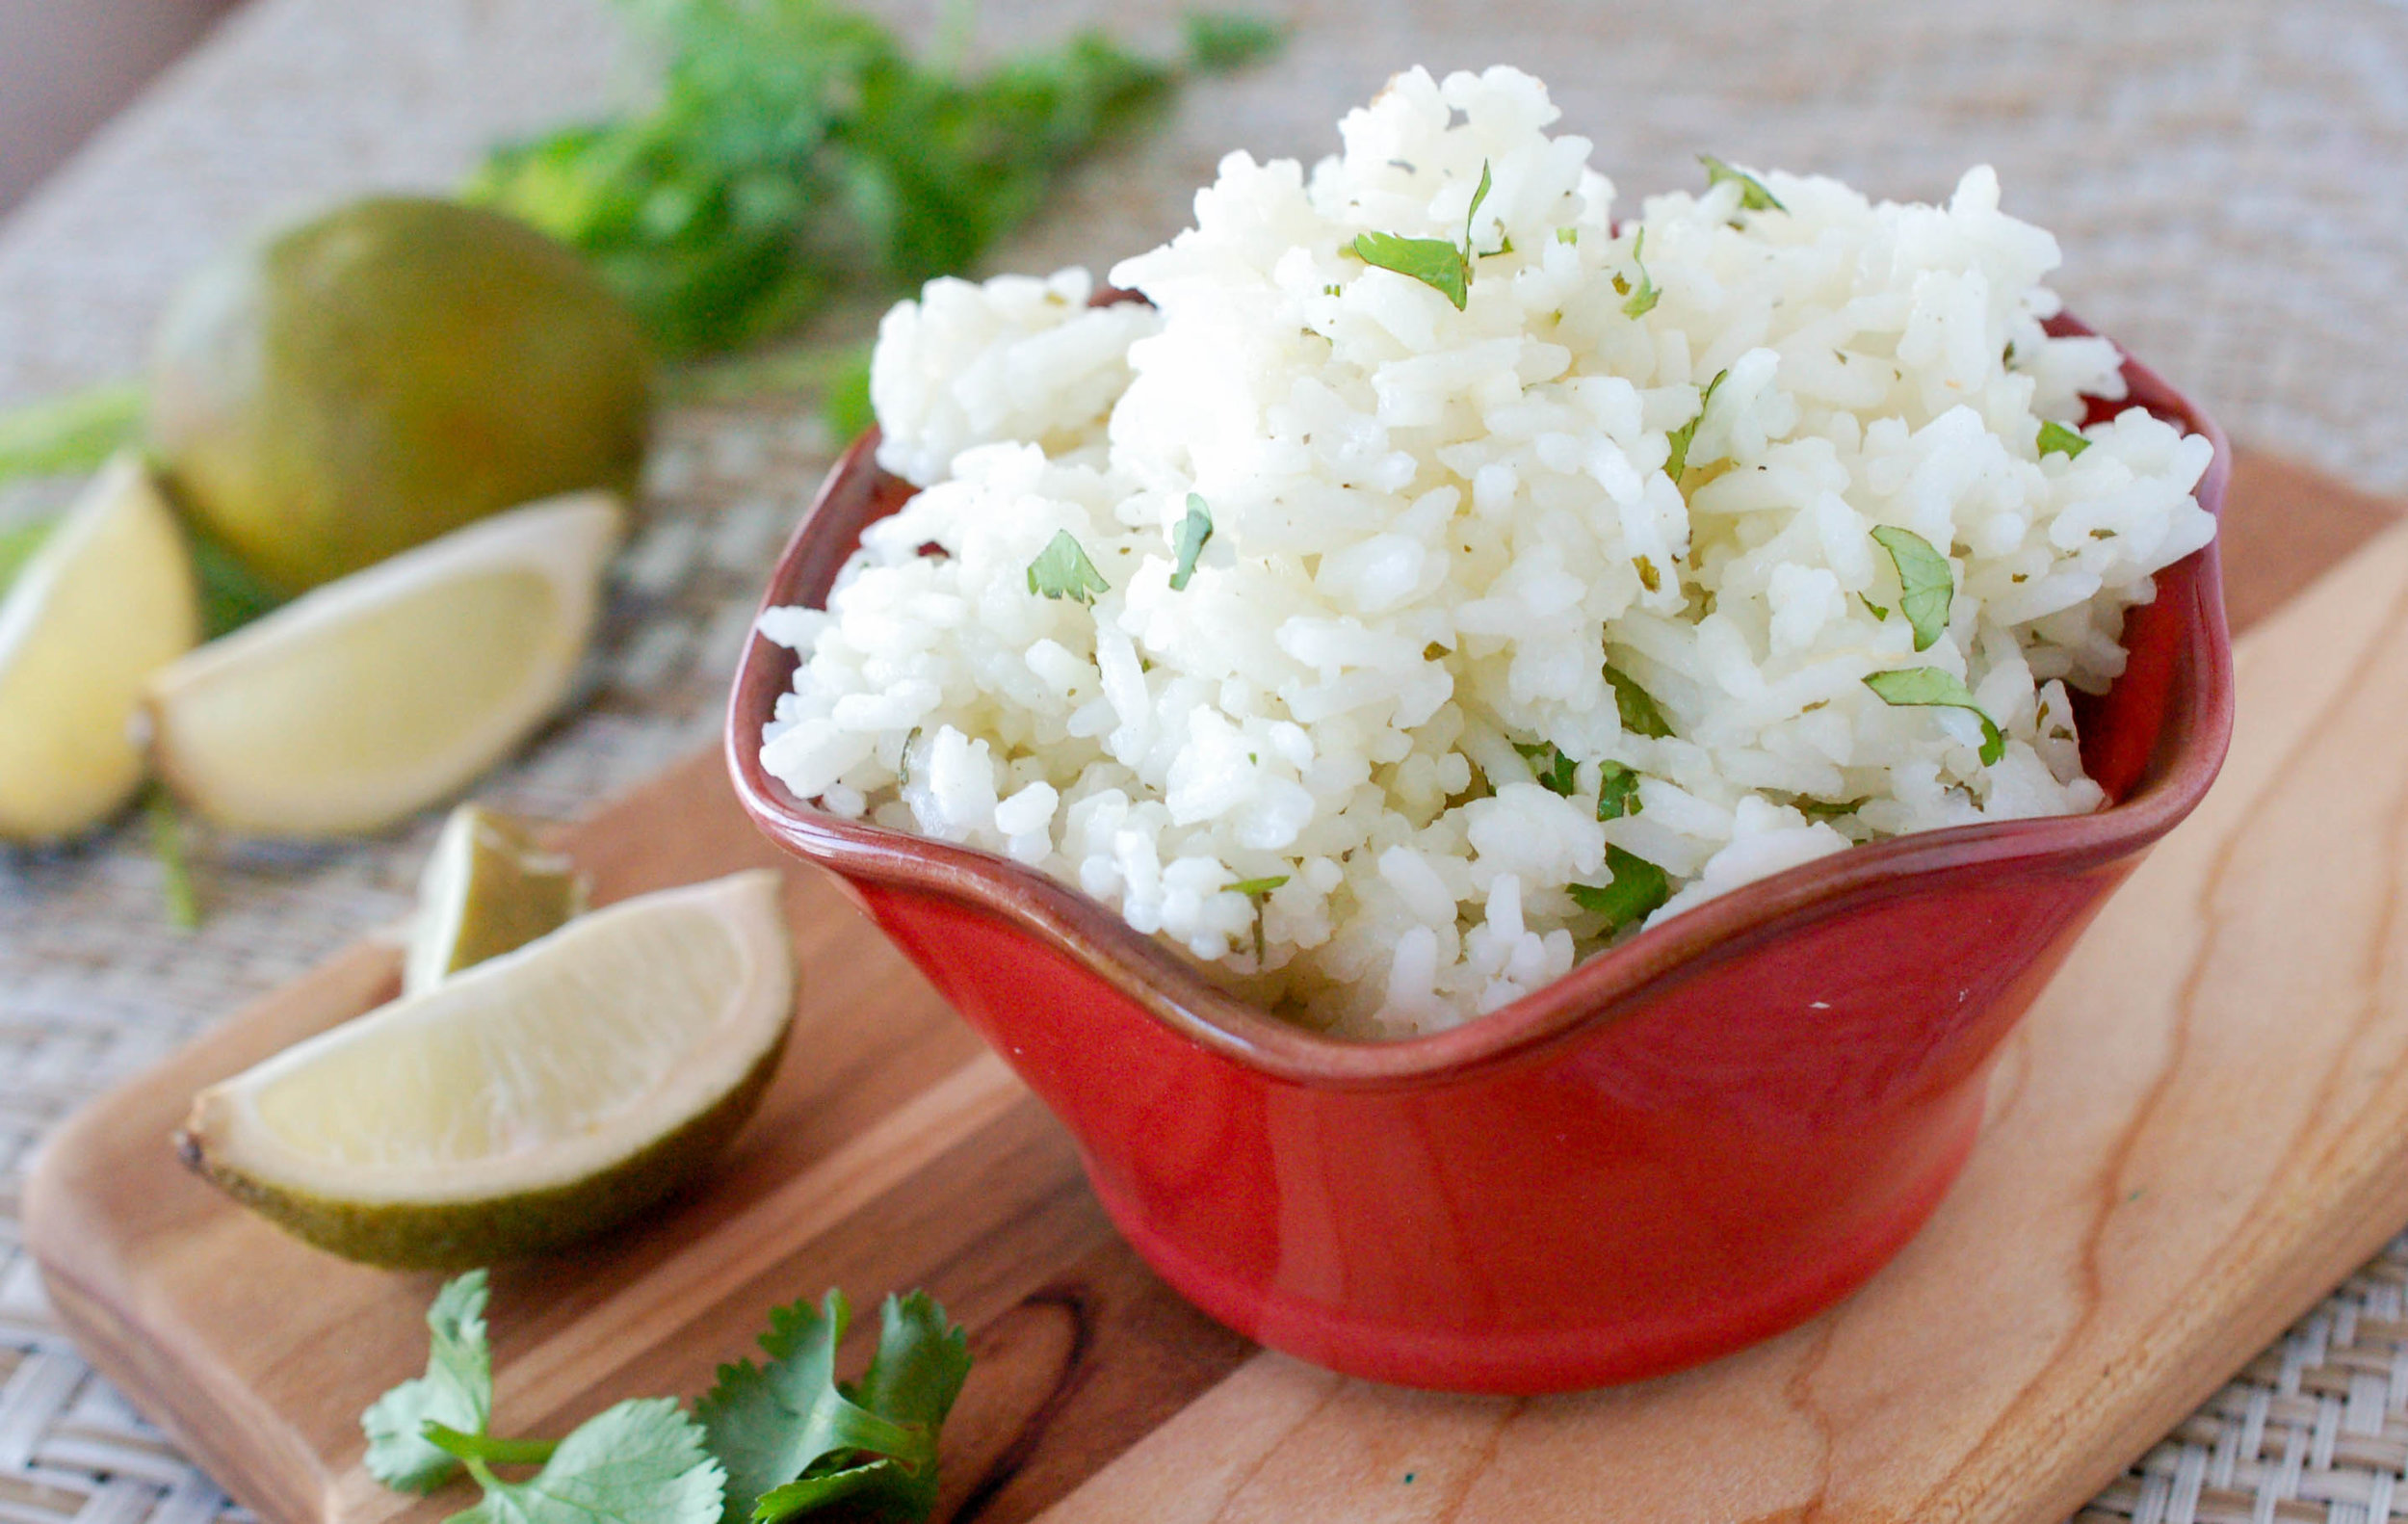 Chardonnay Lime & Cilantro Rice Recipe